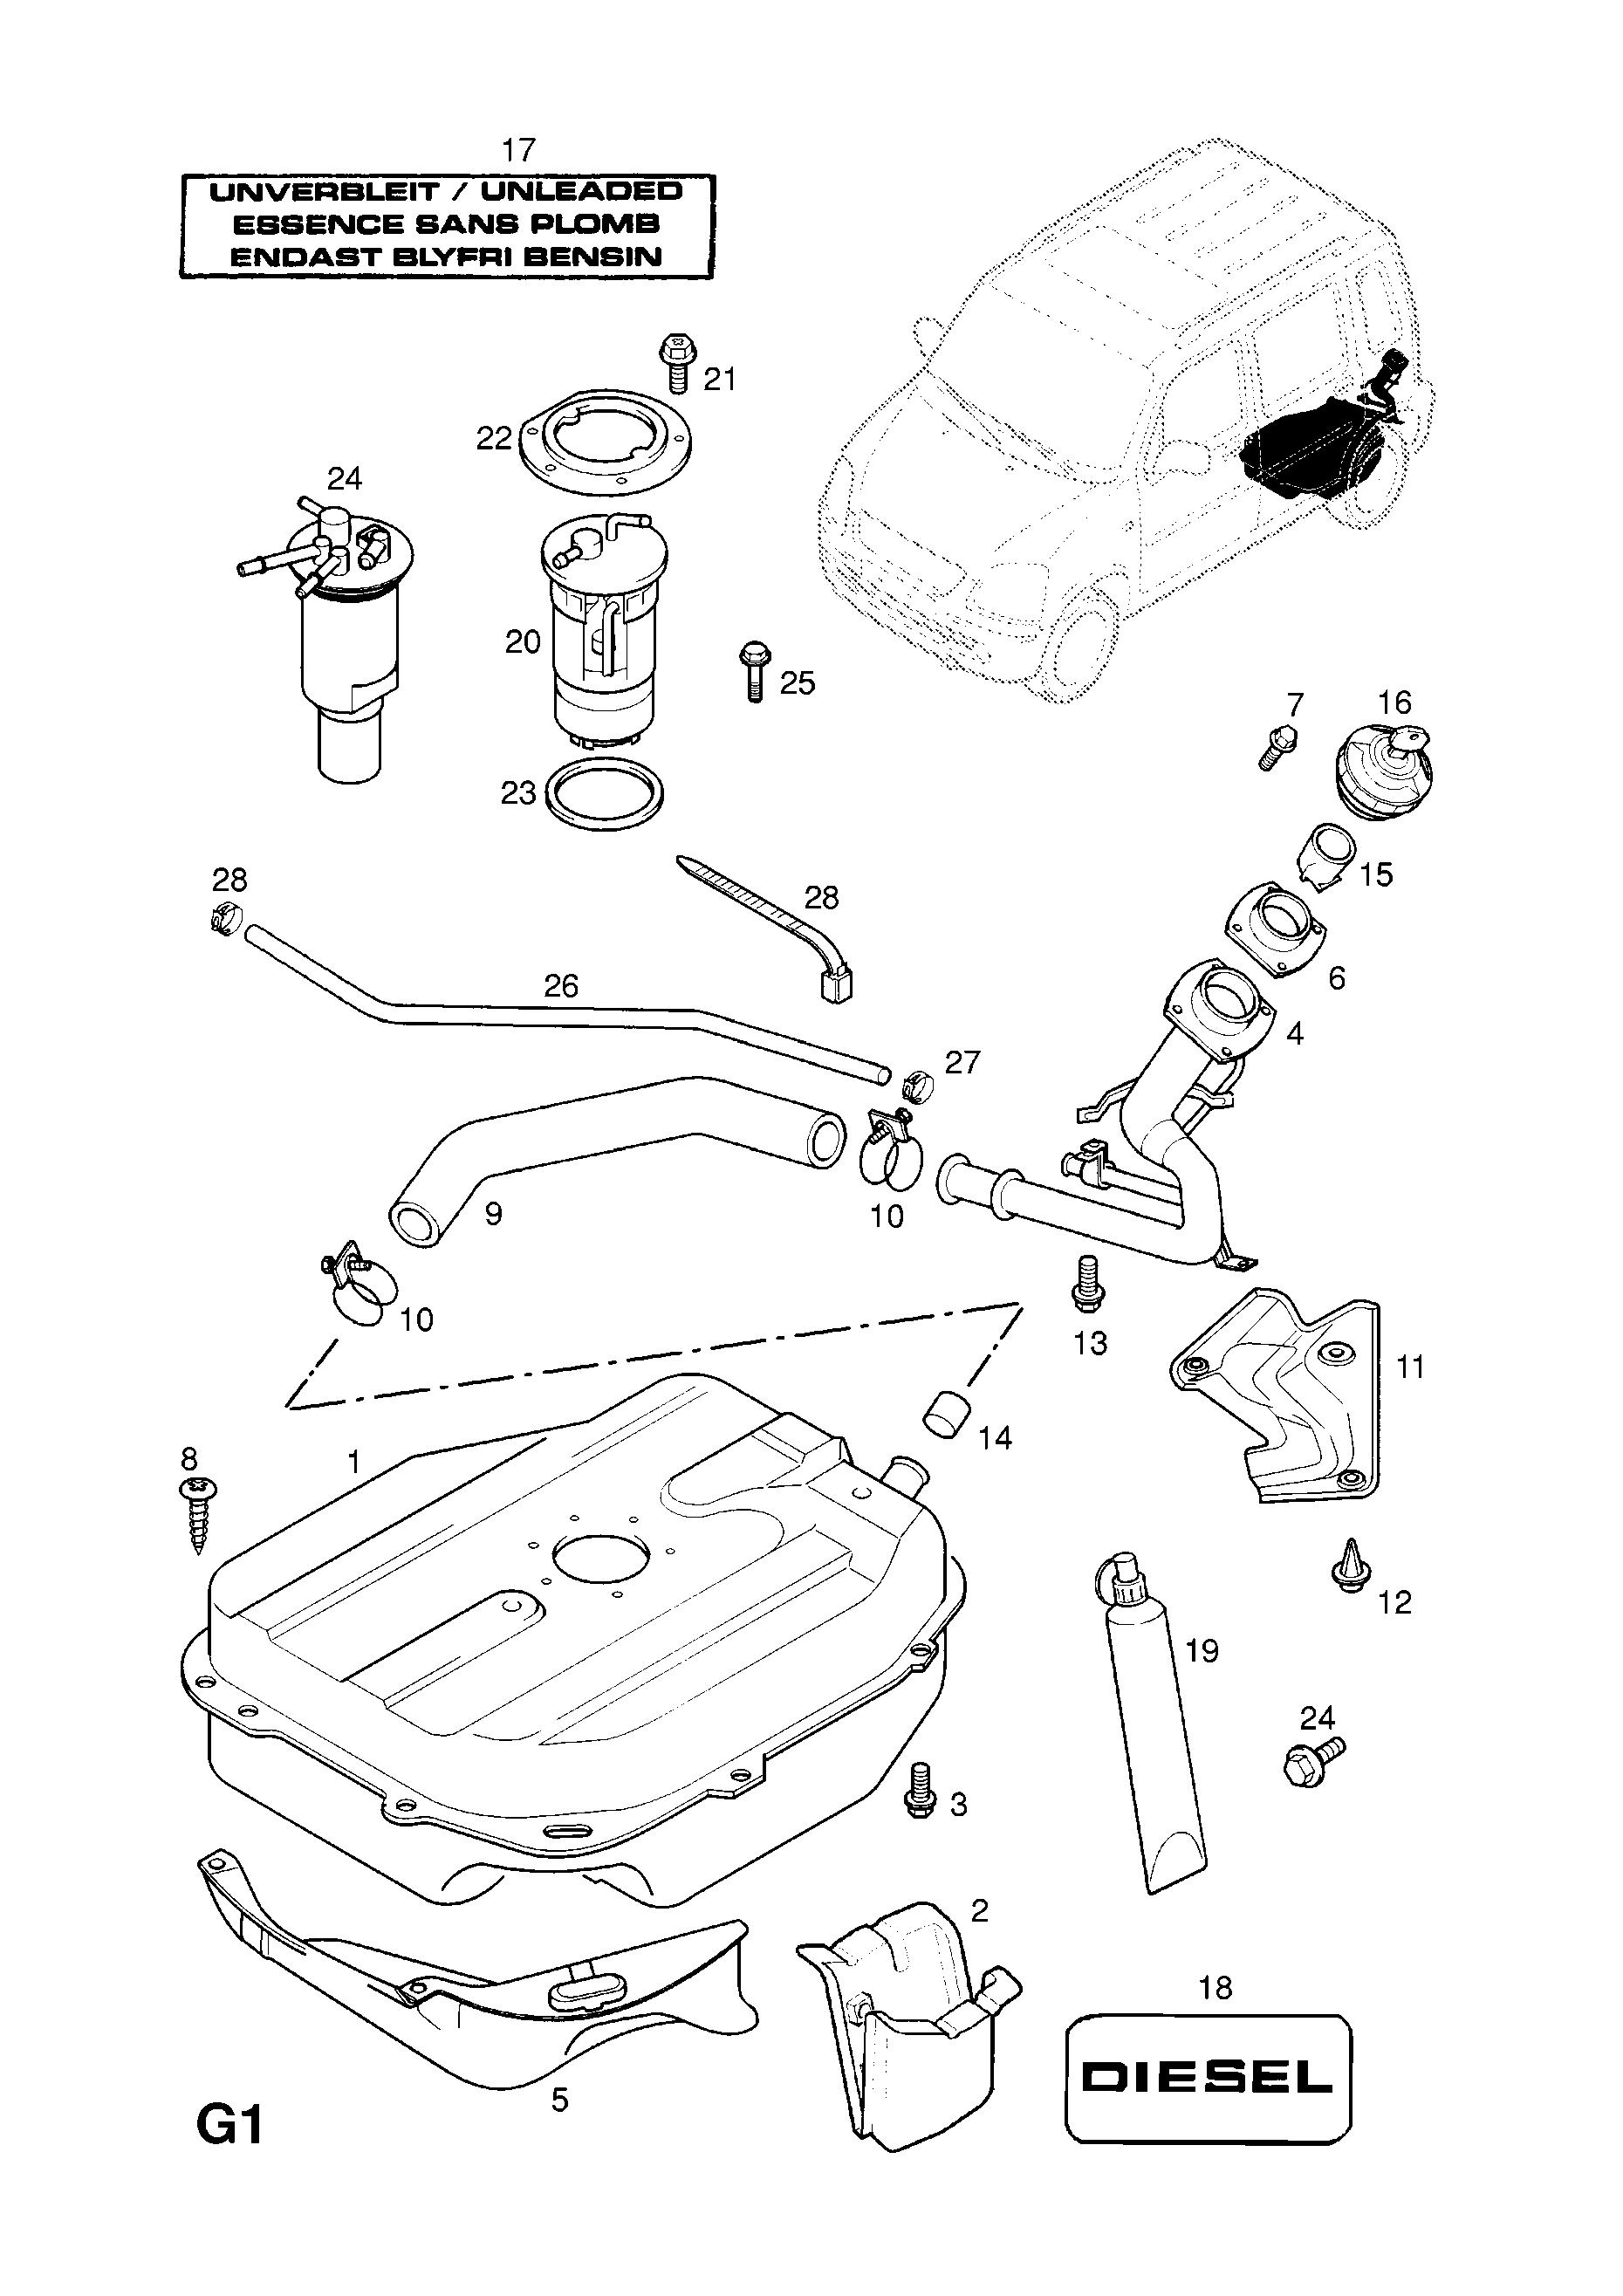 chilton repair manual 2007 ford taurus